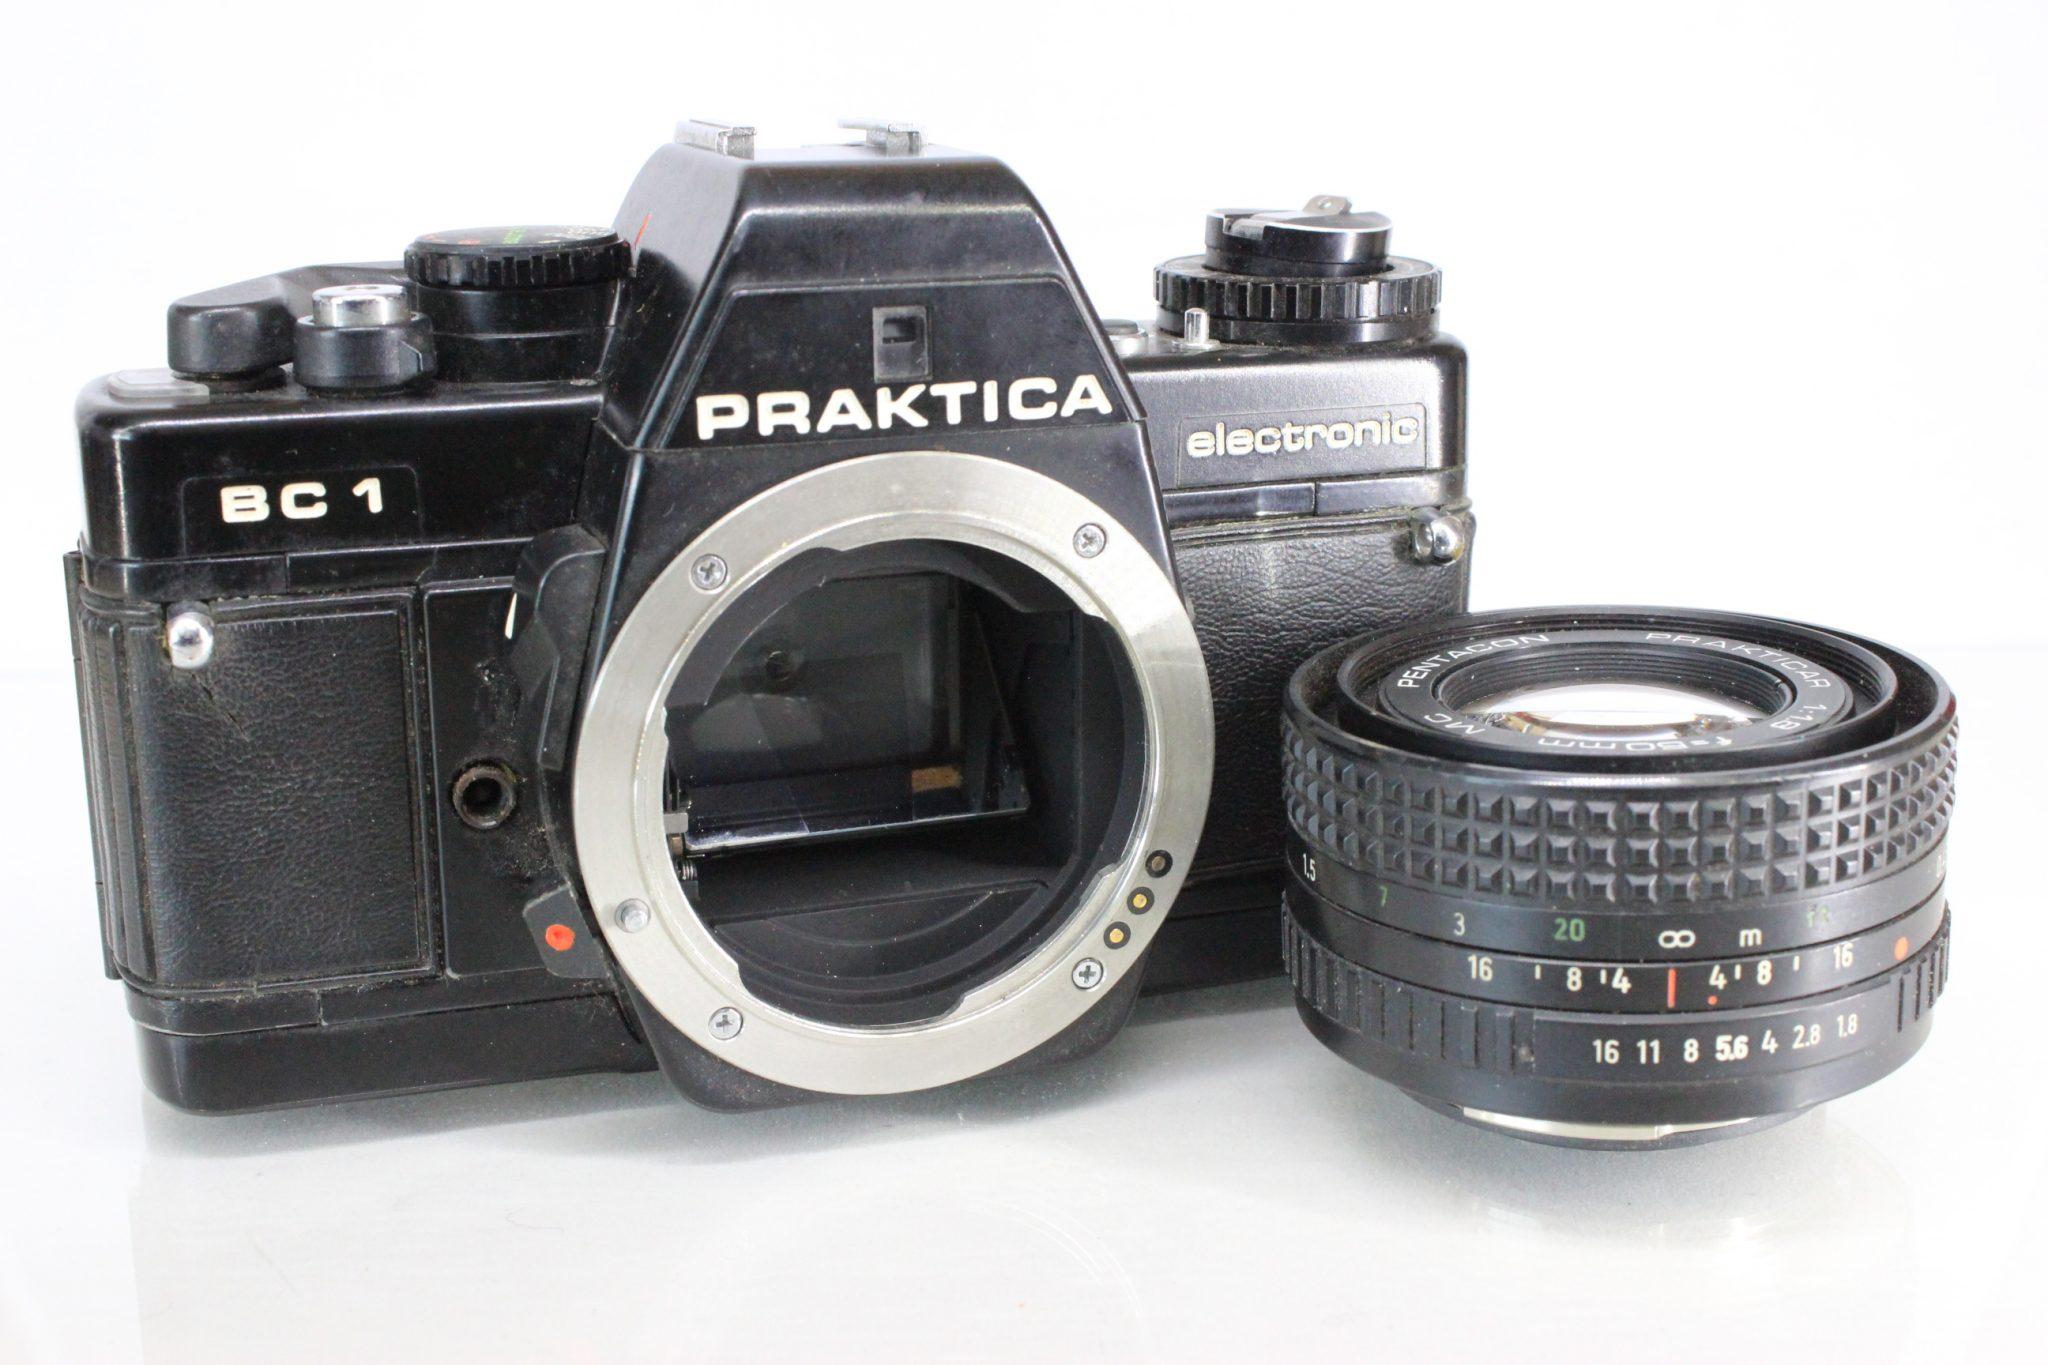 Praktica bc1 35mm slr film camera with 50mm 1:1.8 lens photocapital